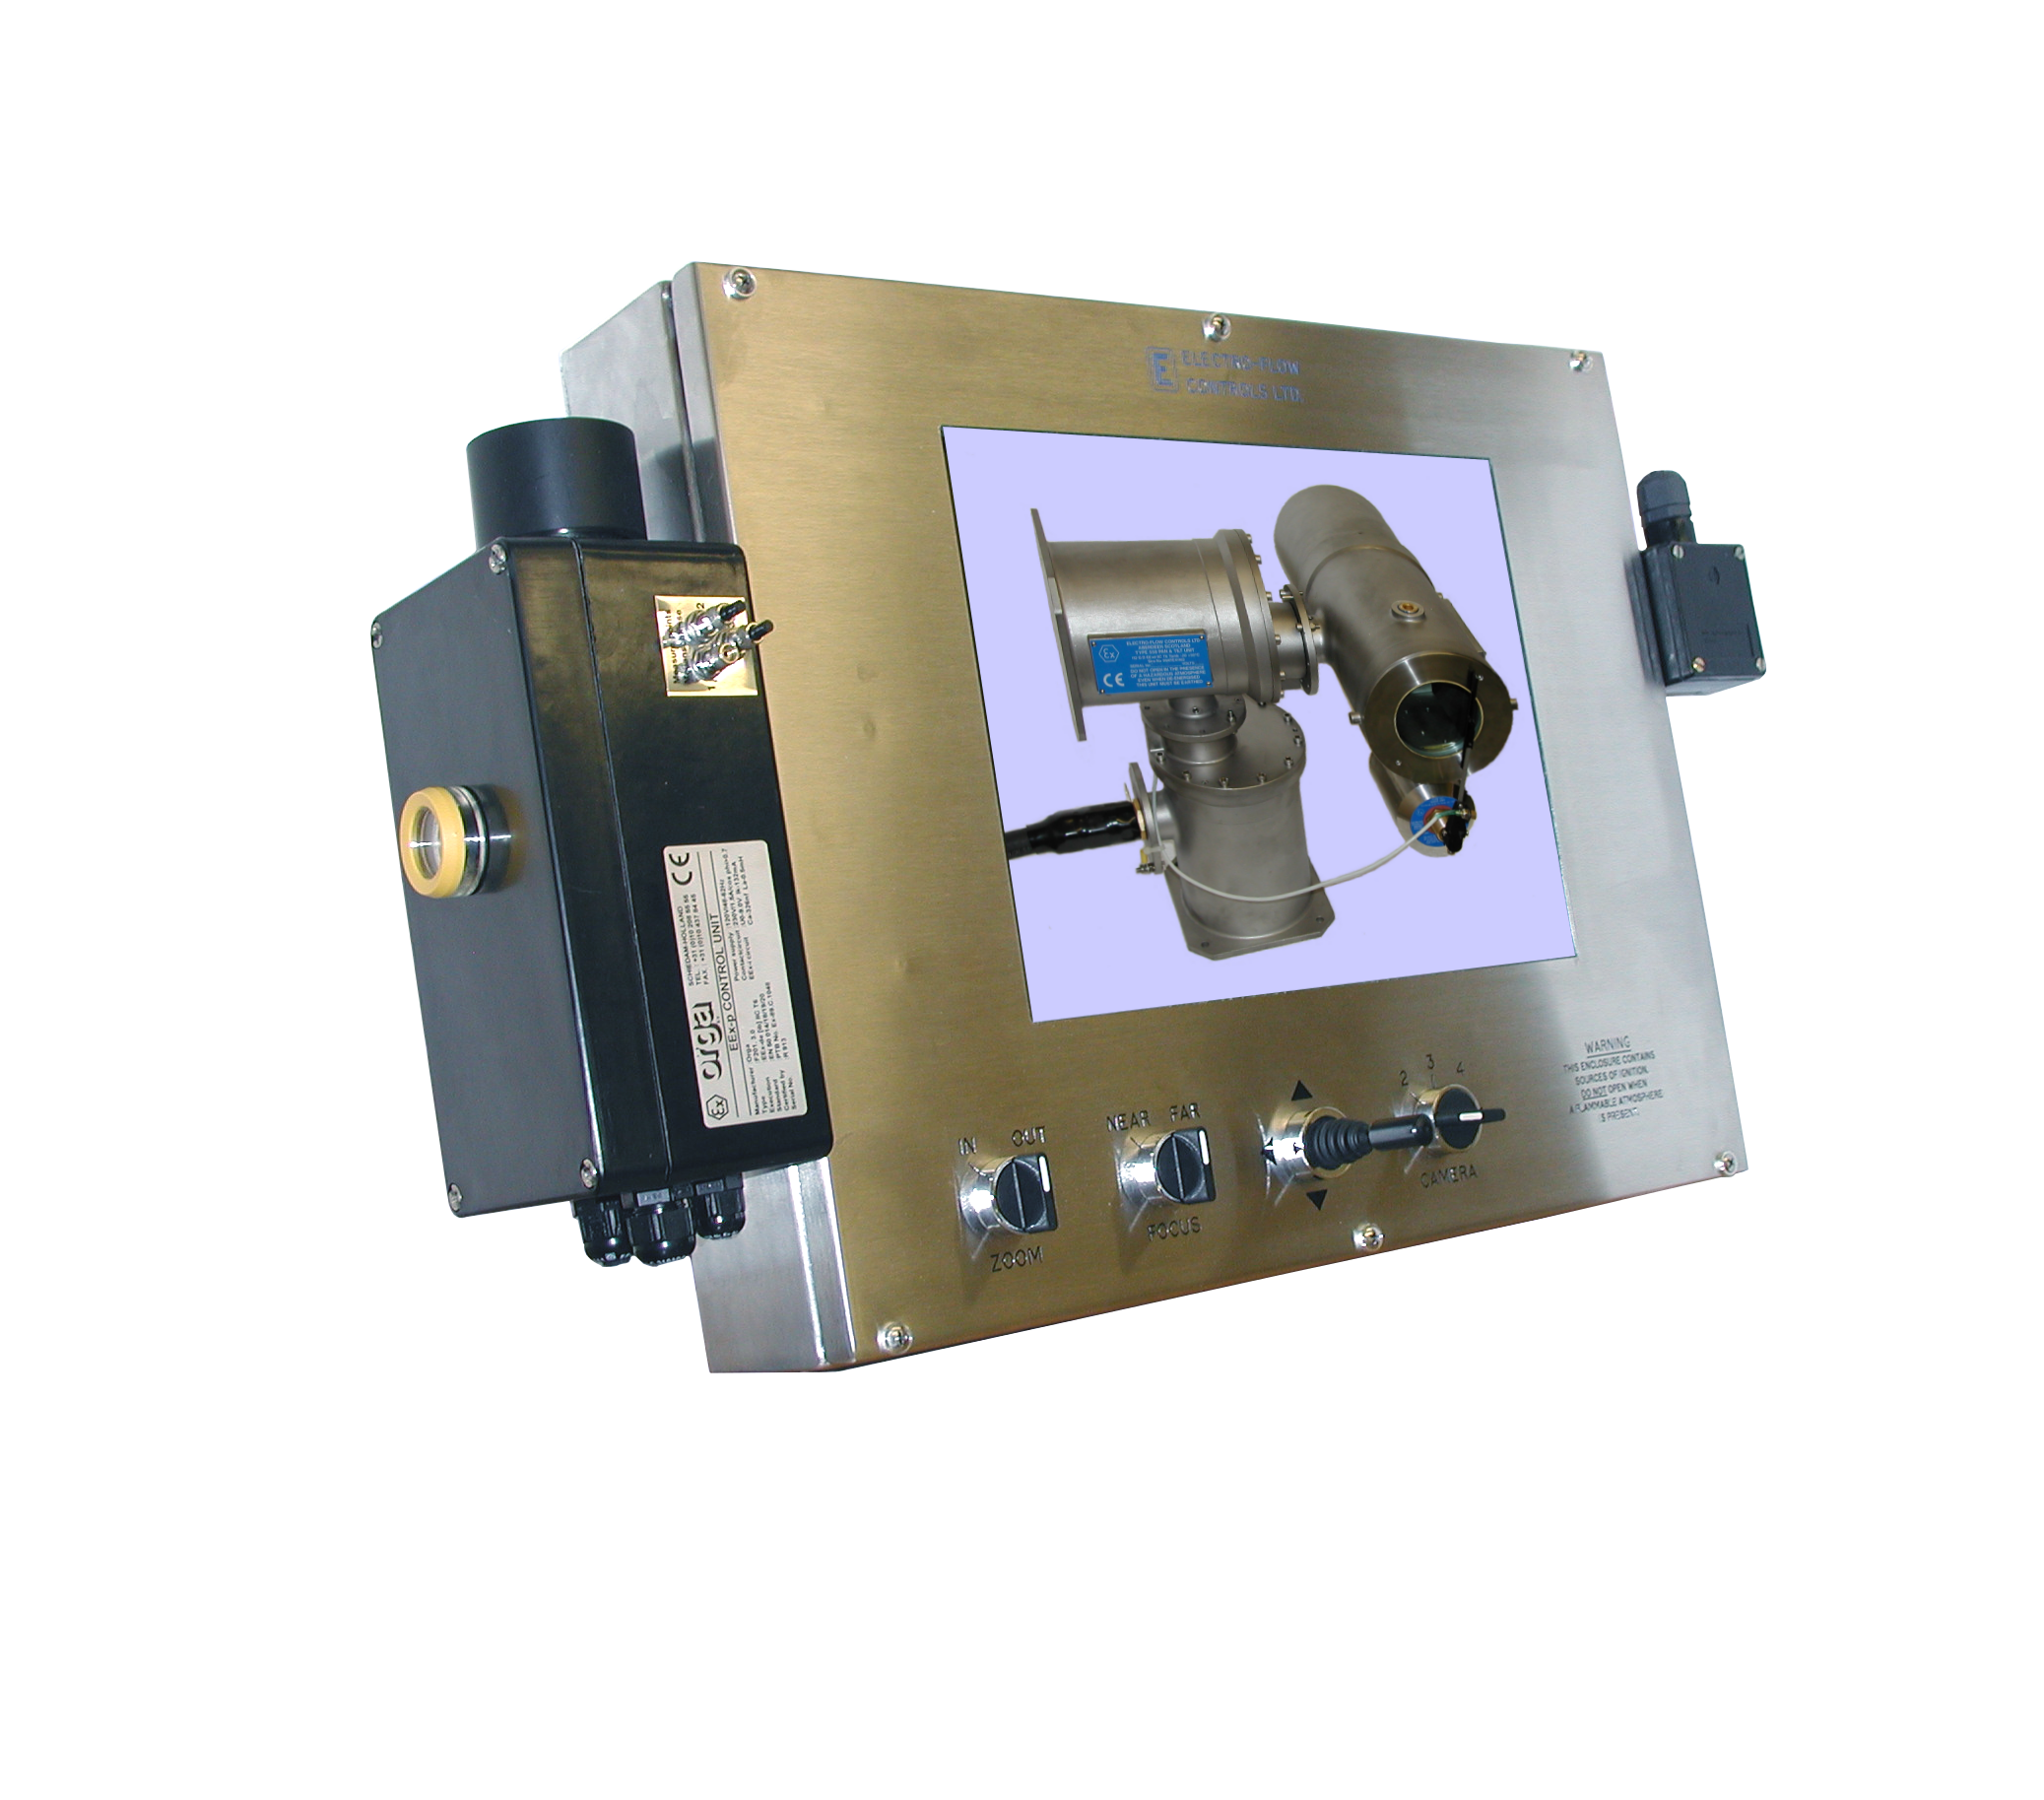 Driller s CCTV monitor